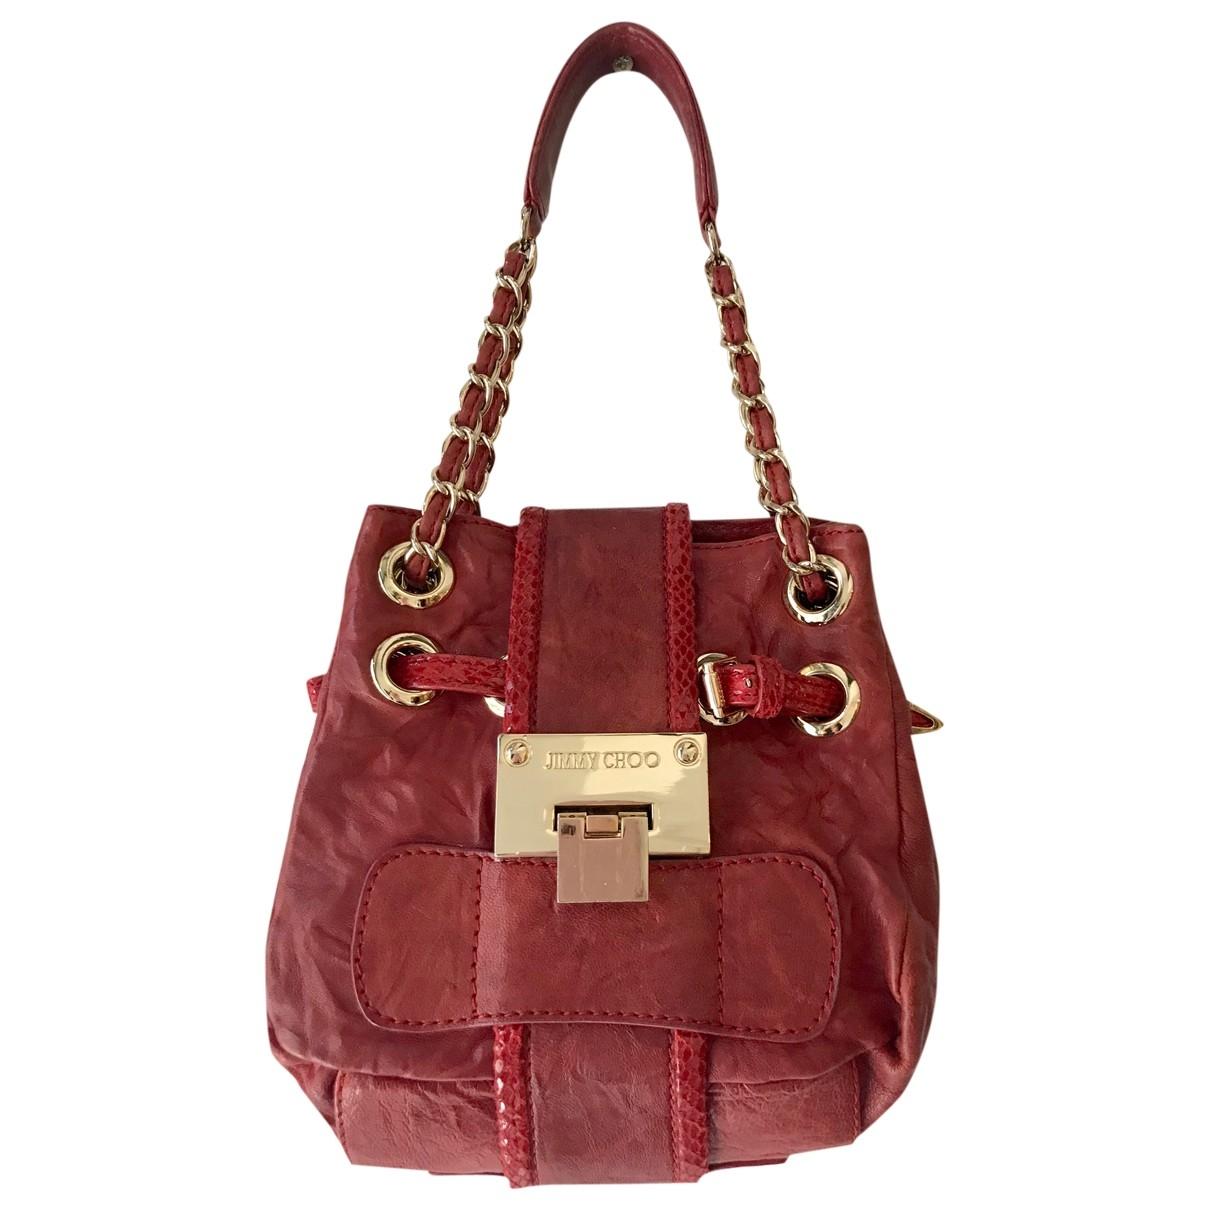 Jimmy Choo \N Red Leather handbag for Women \N